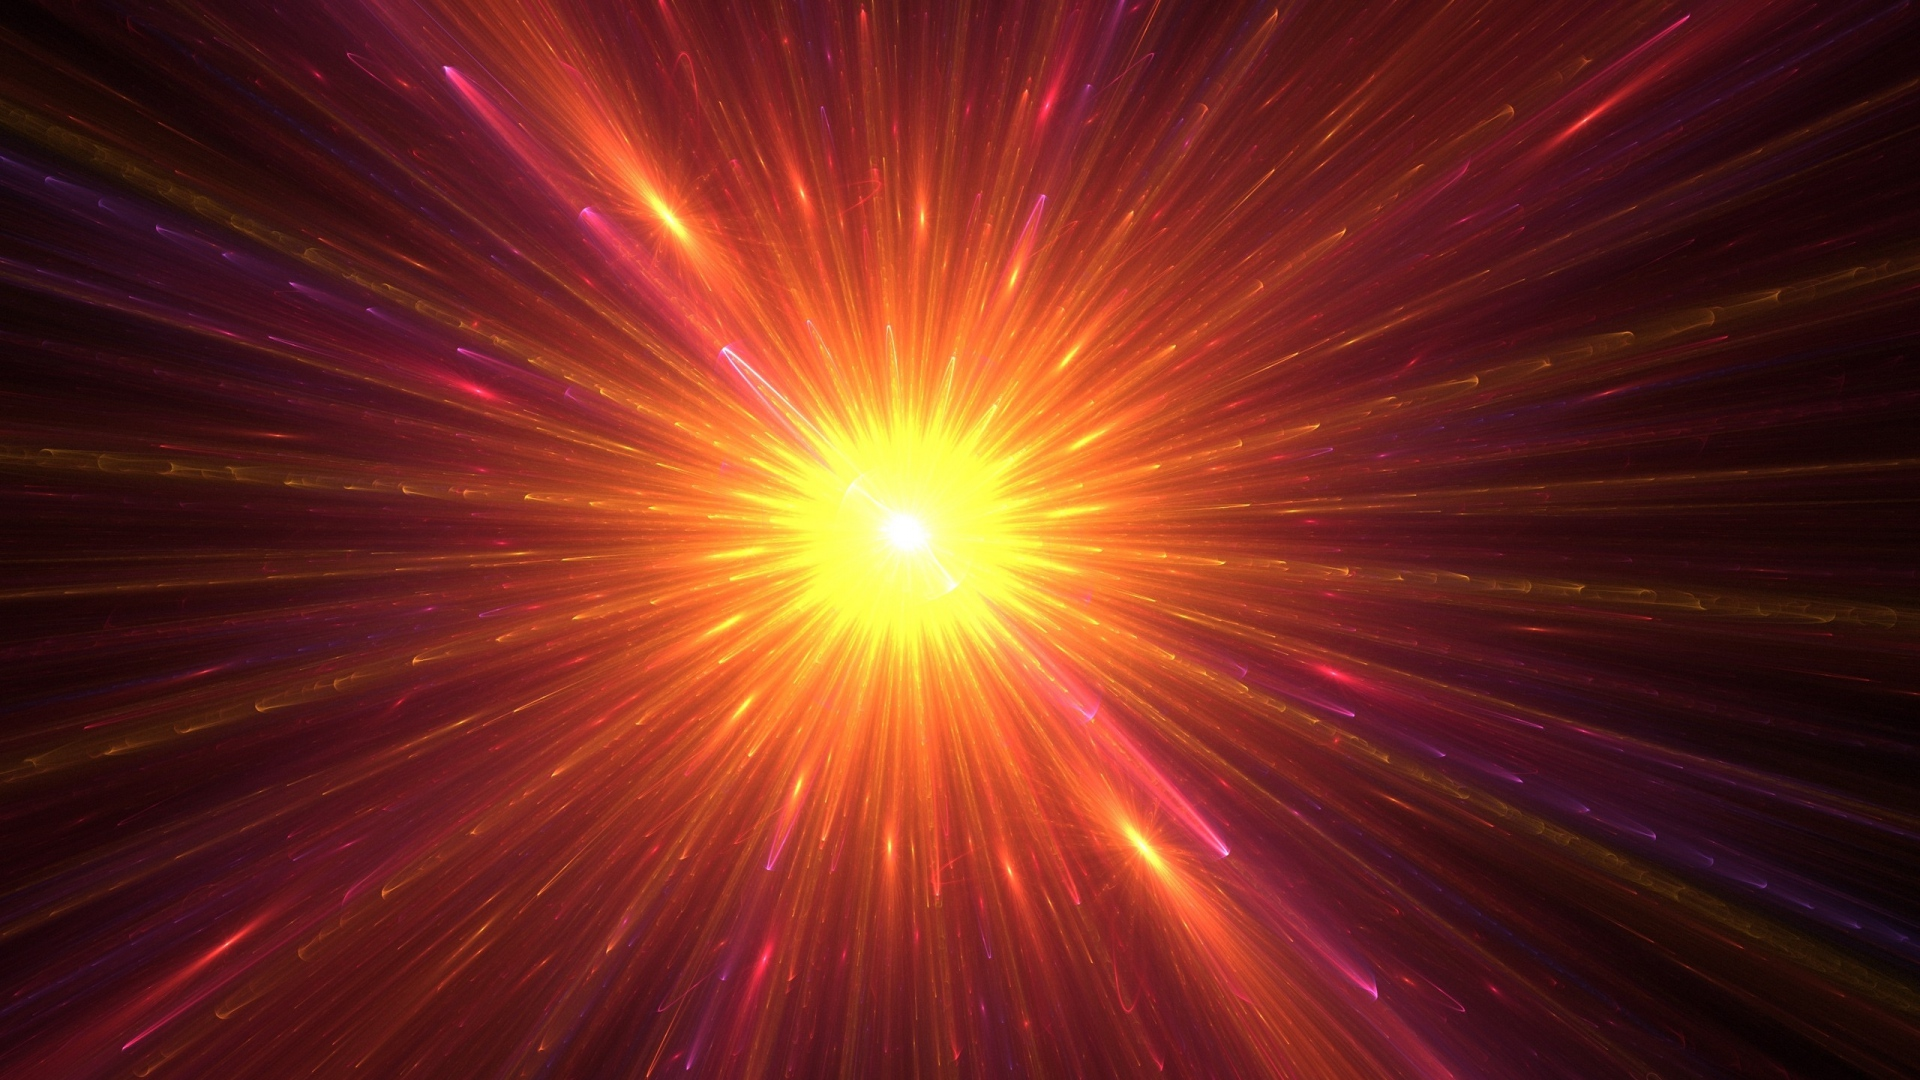 Earnings Disclaimer >> Download Wallpaper 1920x1080 sun, light, rays, striking Full HD 1080p HD Background